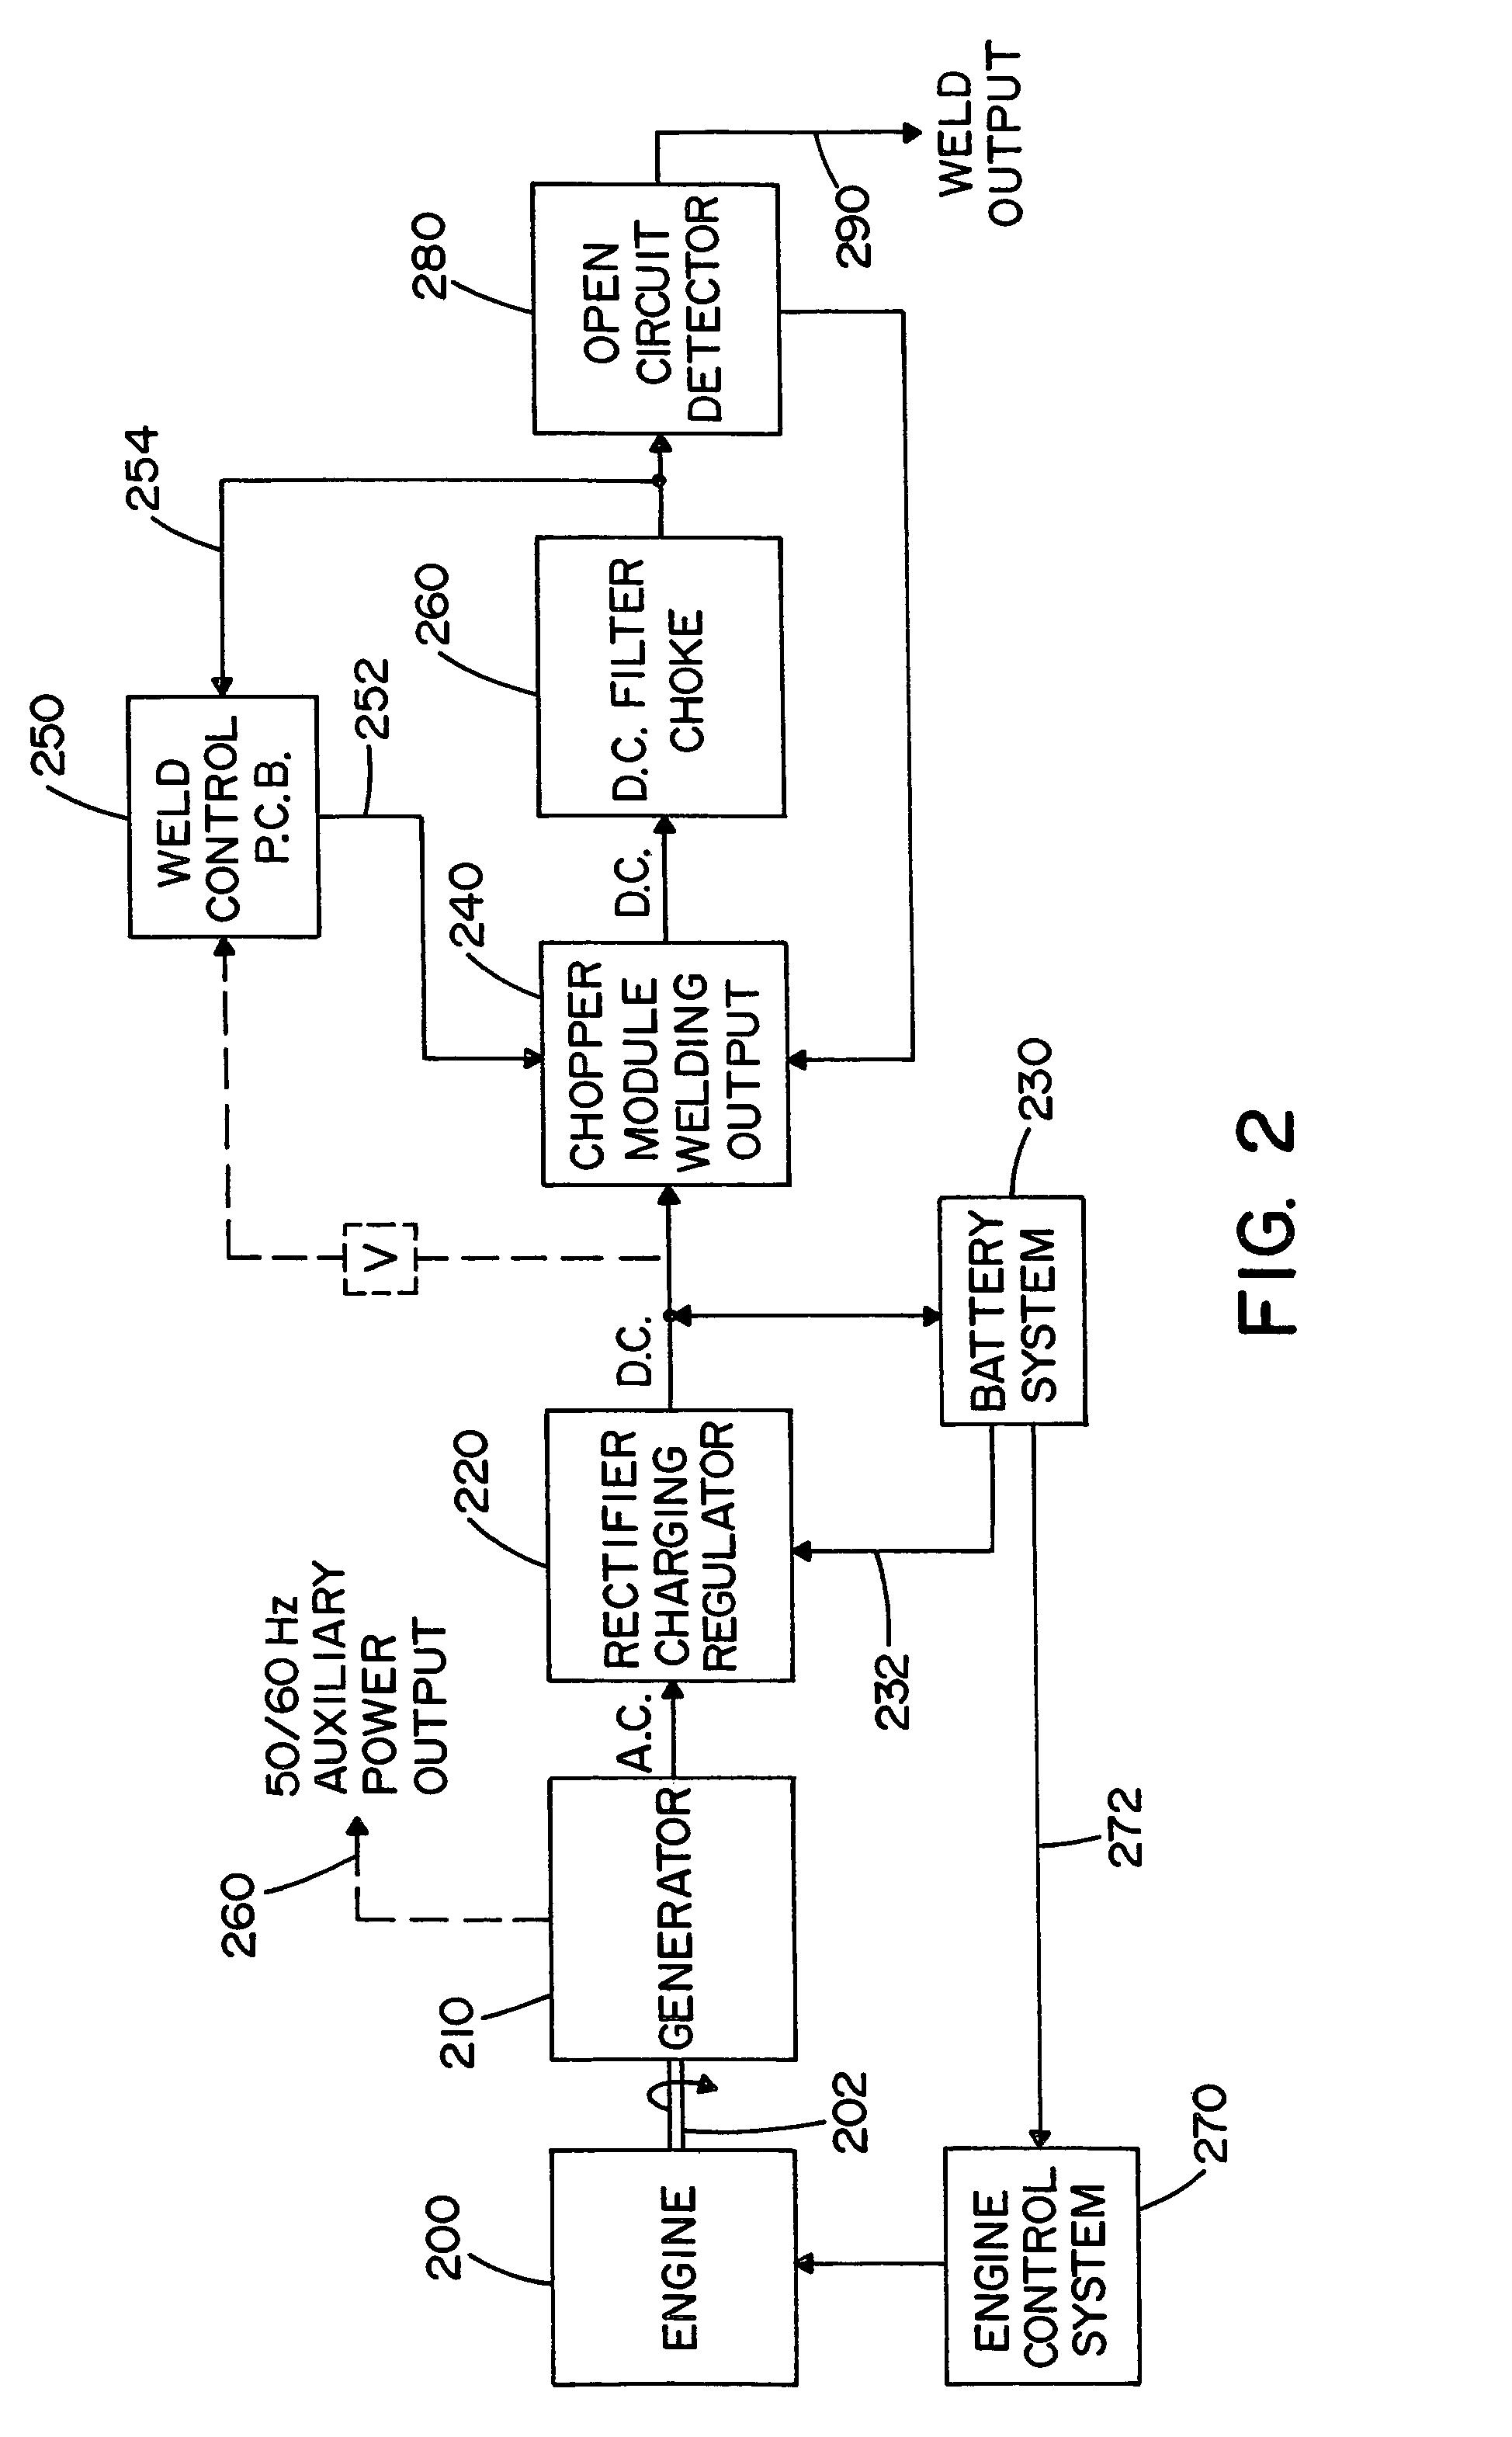 Battery Isolator Wiring Diagram Gmc Truck Trusted Schematics Intellitec Disconnect Quicksilver Diagrams